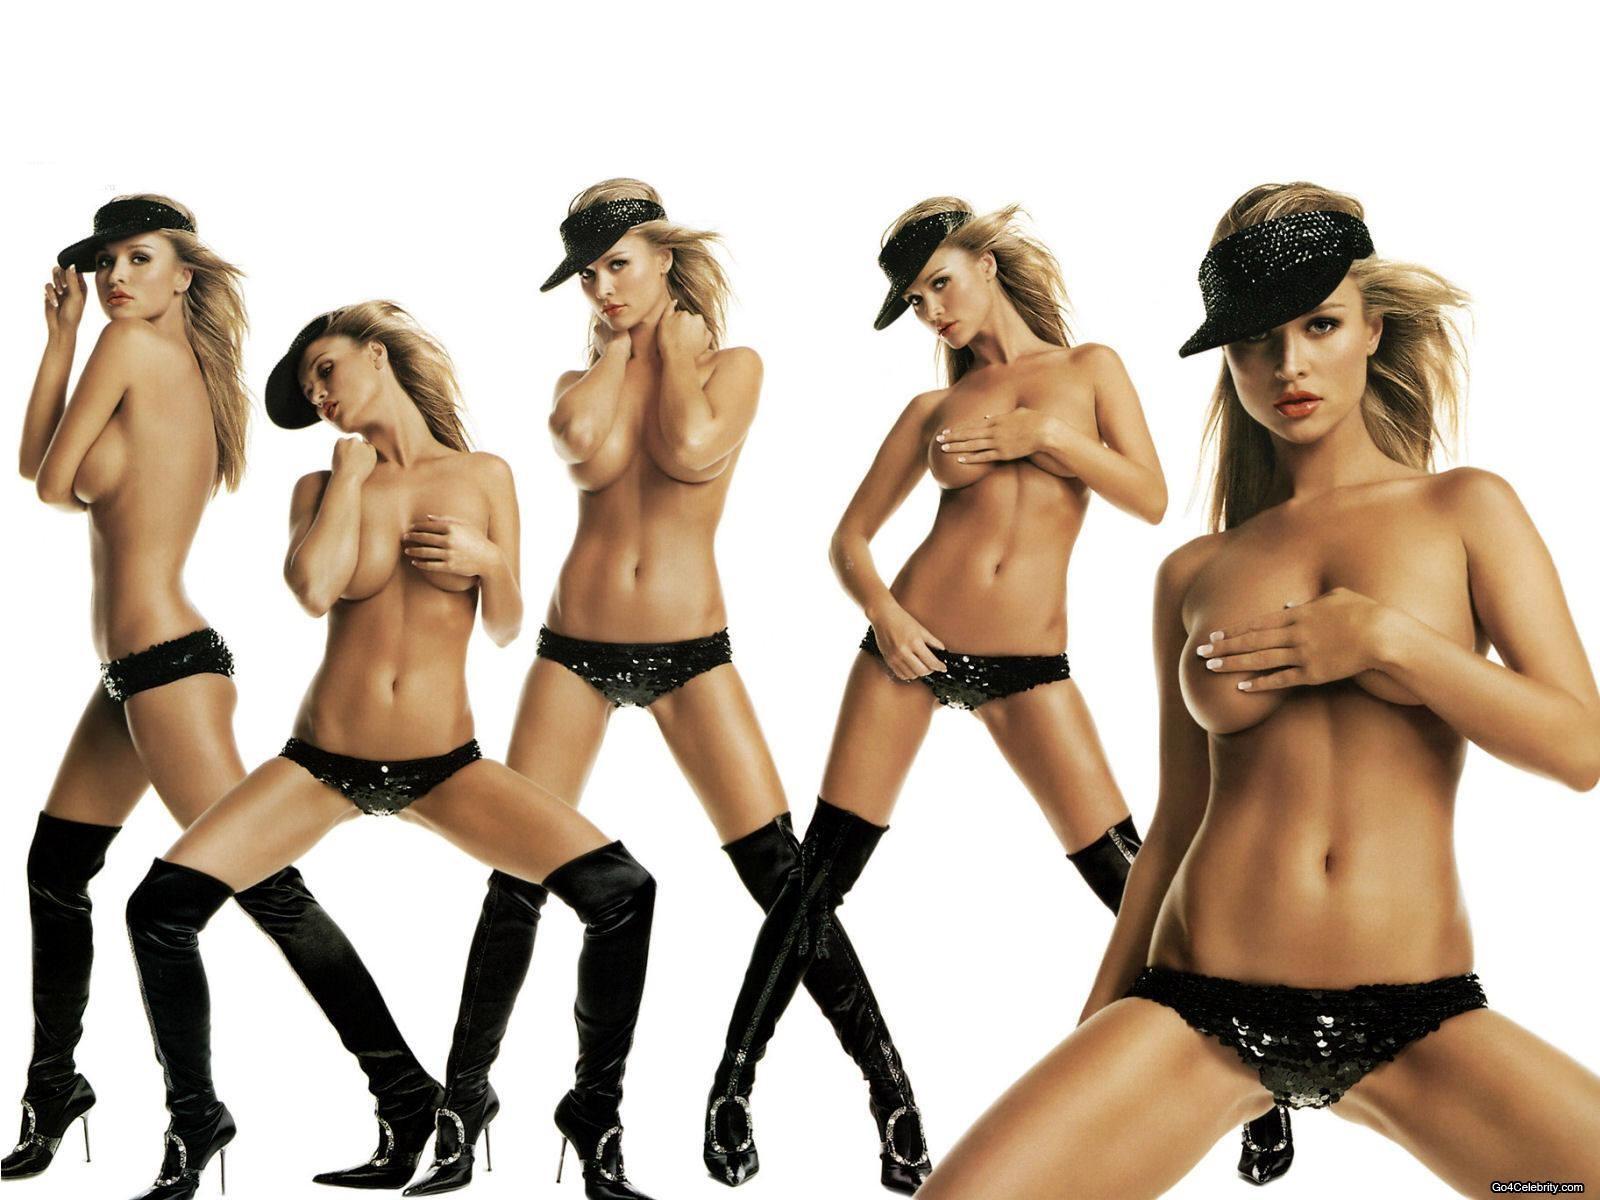 http://1.bp.blogspot.com/__q_aLNWsi74/S9zXIHk2diI/AAAAAAAAAKs/S5-BNaoGoKk/s1600/joanna-krupa-wallpapers-52.jpg